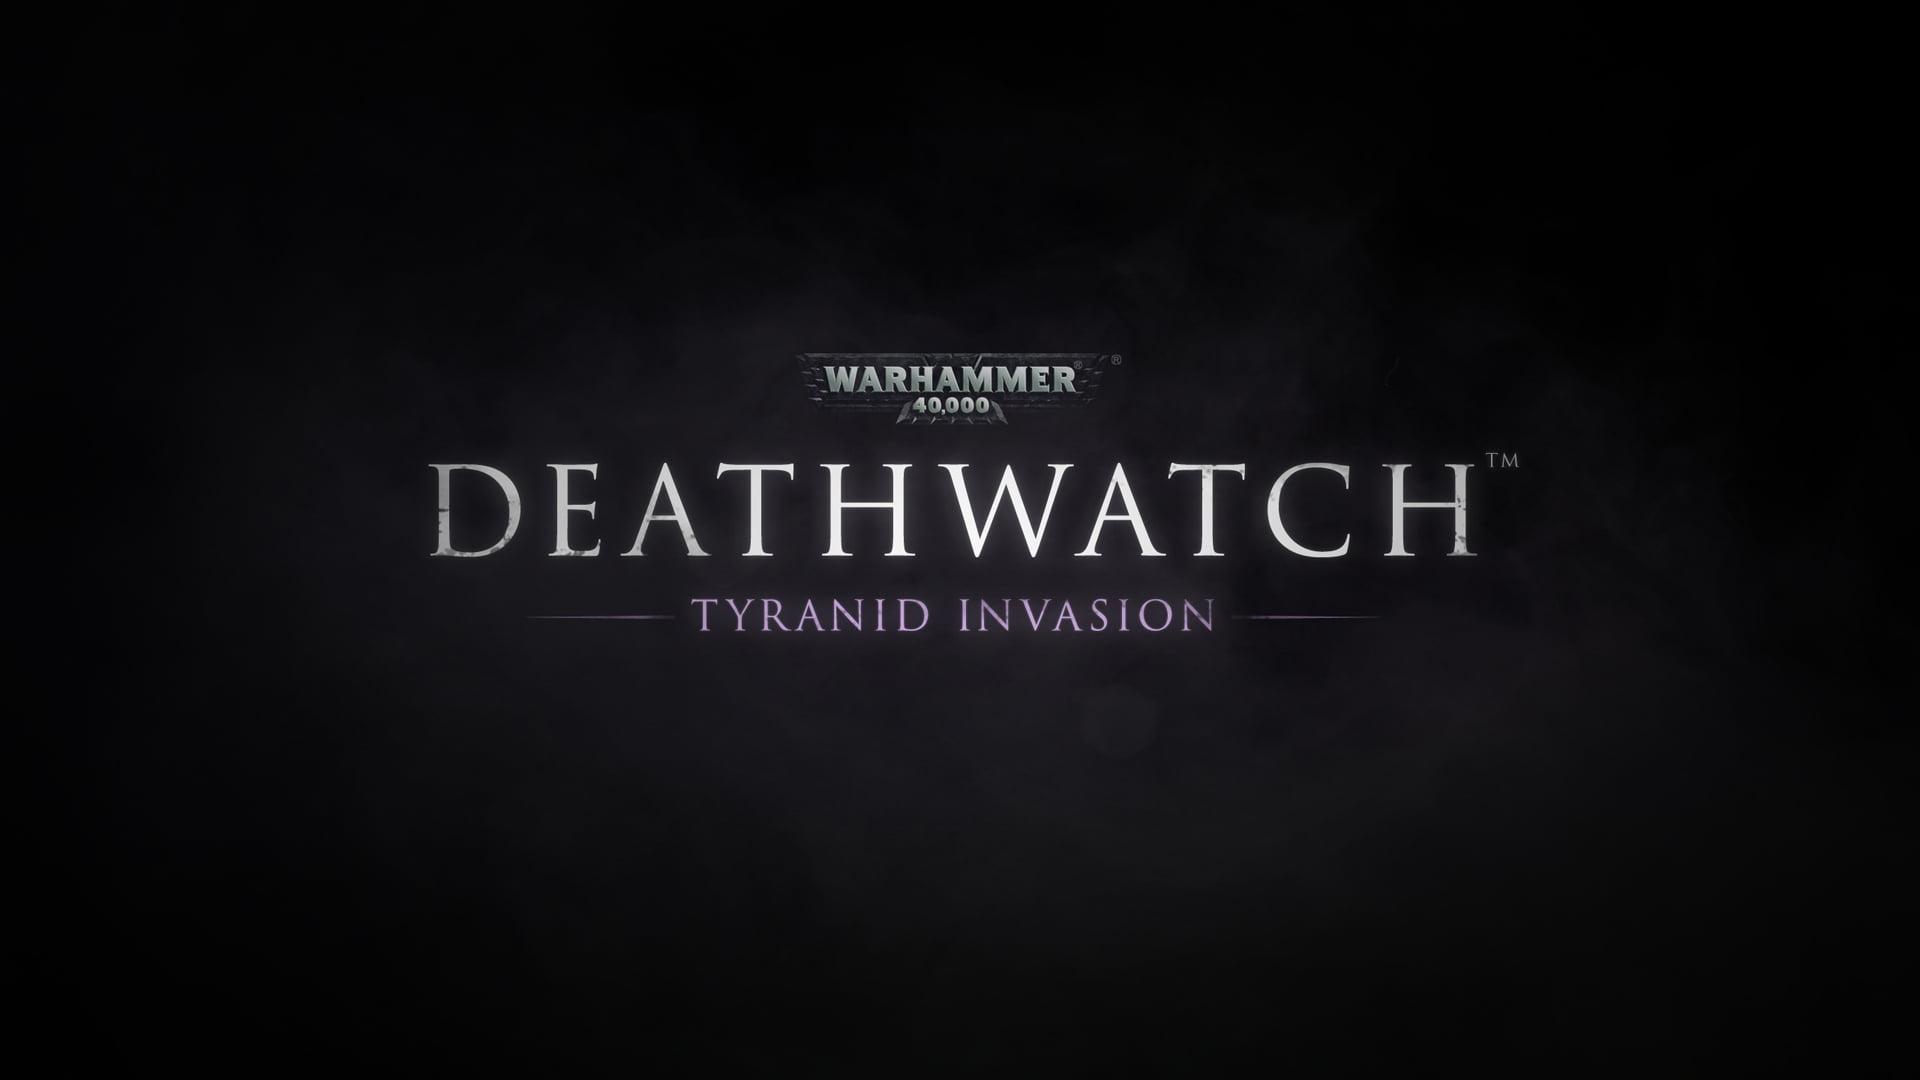 Photo of Warhammer 40,000's Deathwatch: Tyranid Invasion Announced